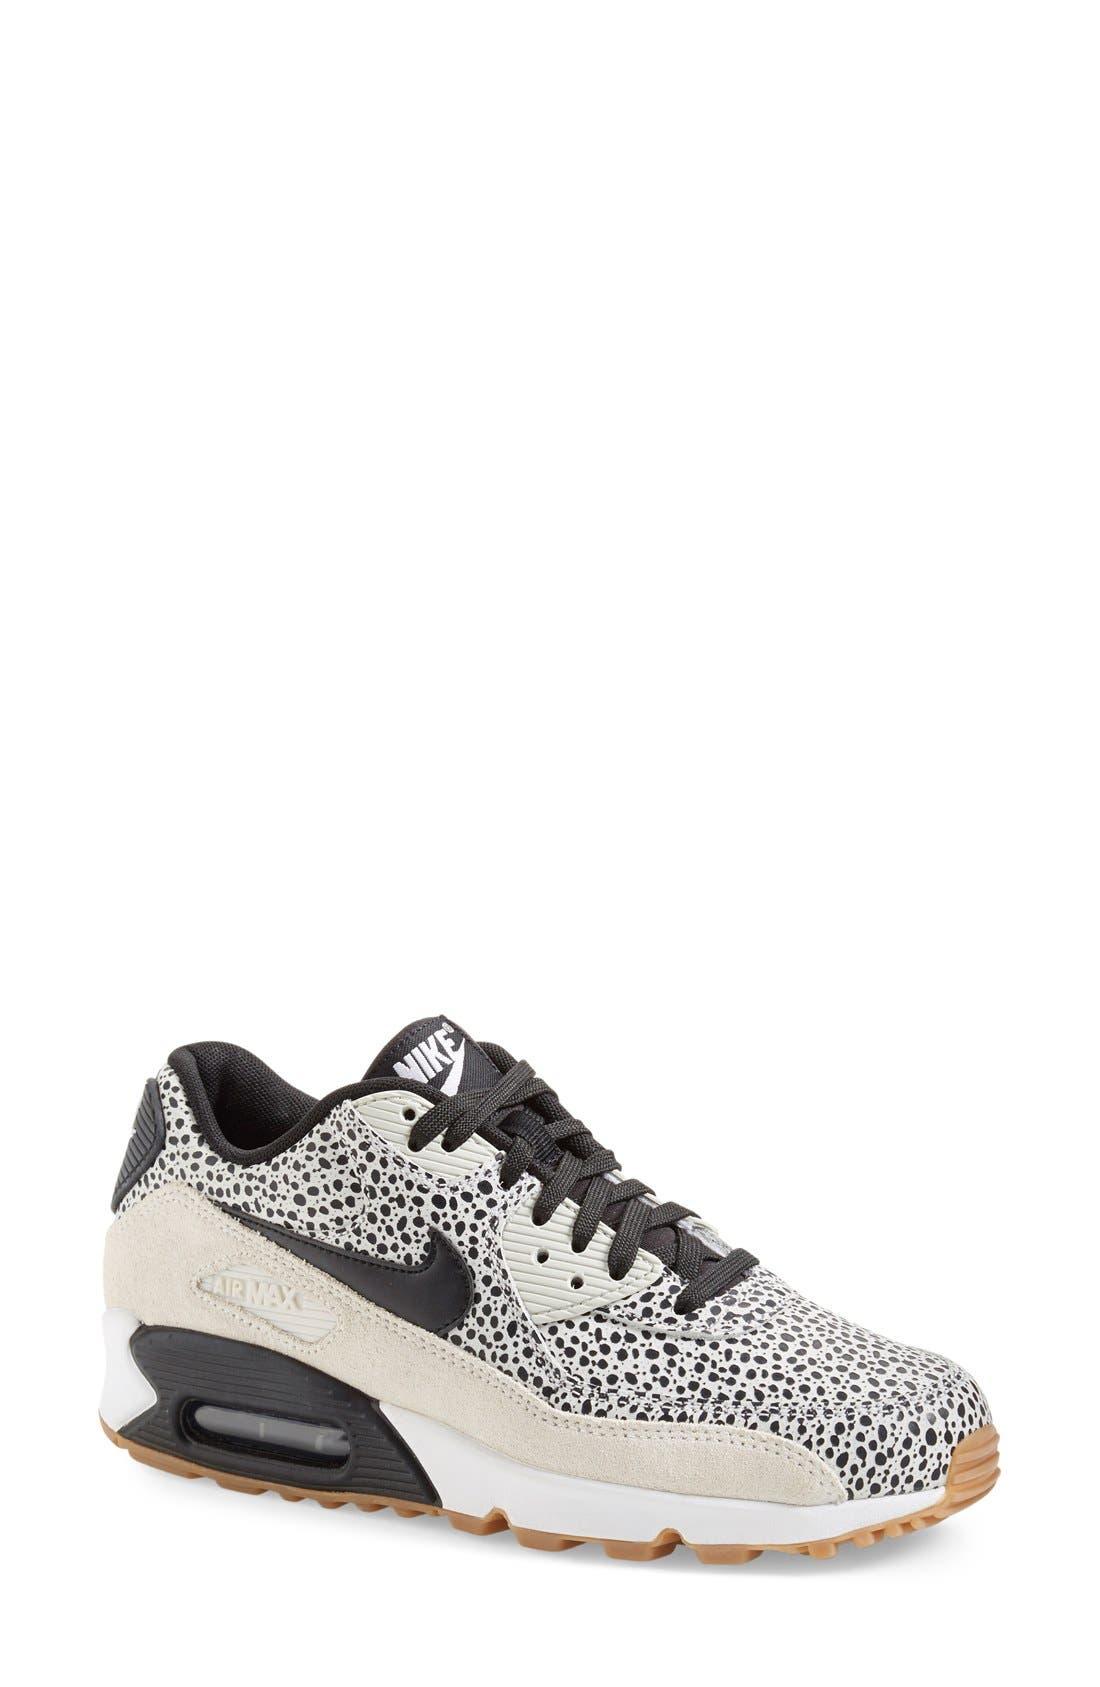 'Air Max 90 - Premium' Sneaker,                             Main thumbnail 1, color,                             White/ Black/ Brown